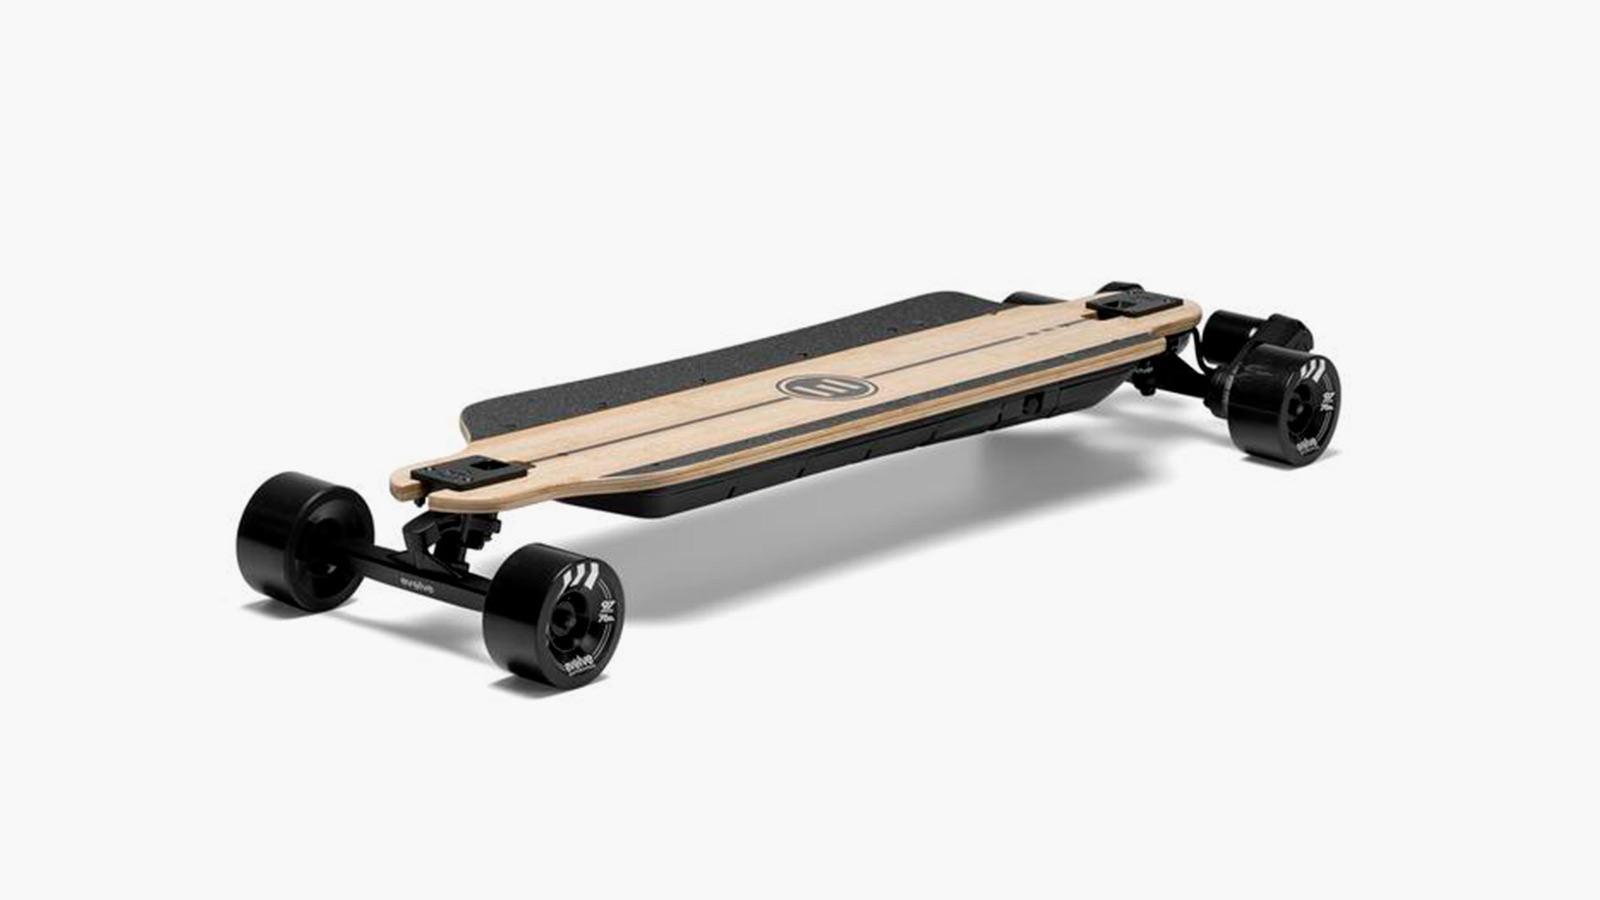 Evolve Bamboo GTR Series Electric Skateboards